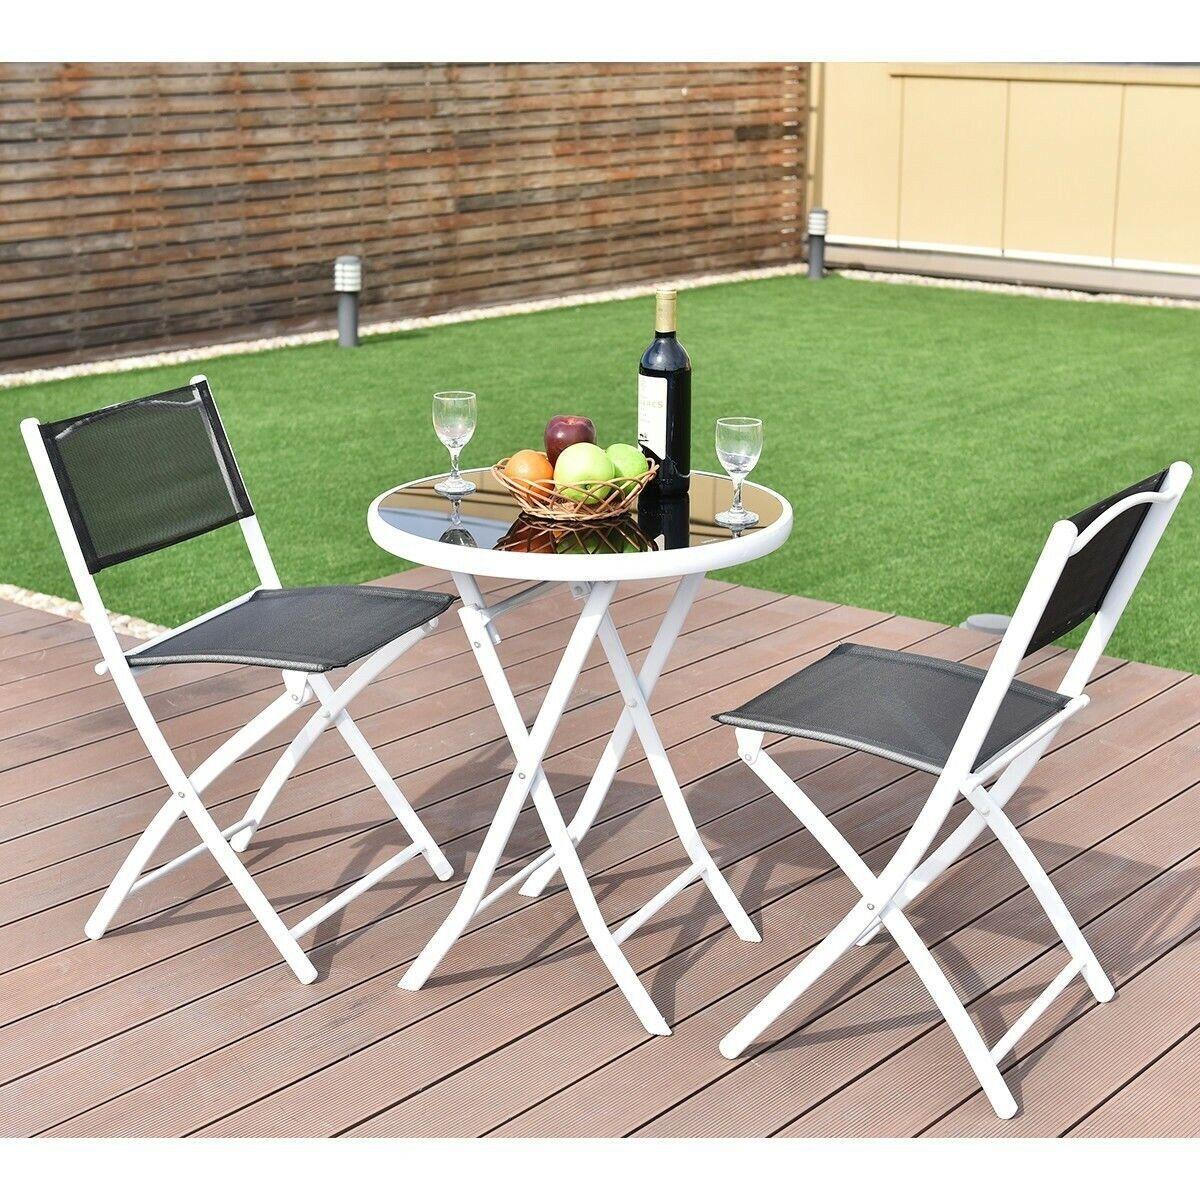 Garden Furniture - 3 PCS Folding Bistro Table Chairs Set Garden Backyard Patio Furniture Black New